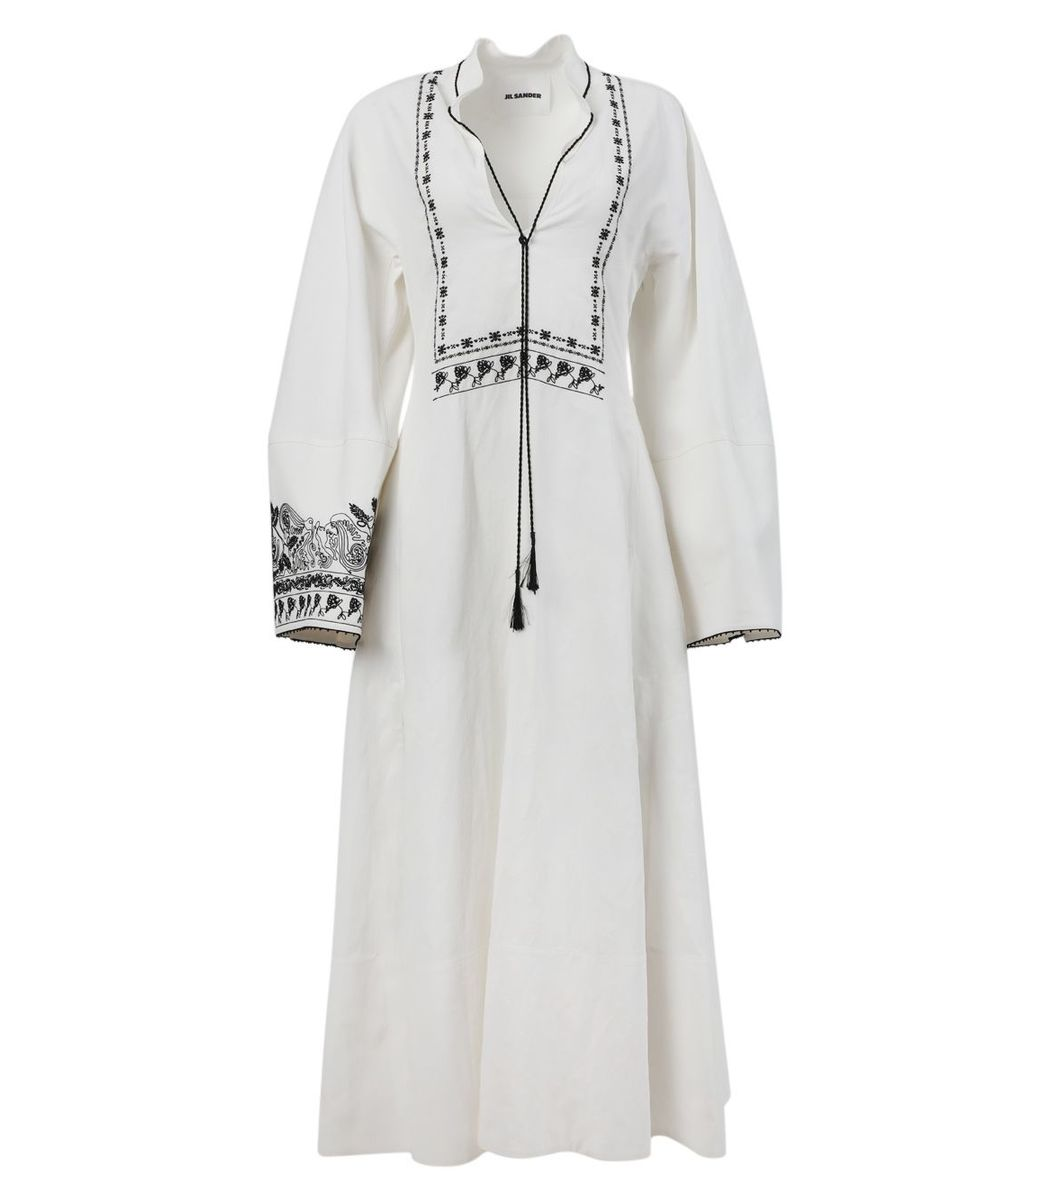 Jil Sander Antique White Long-sleeve Dress